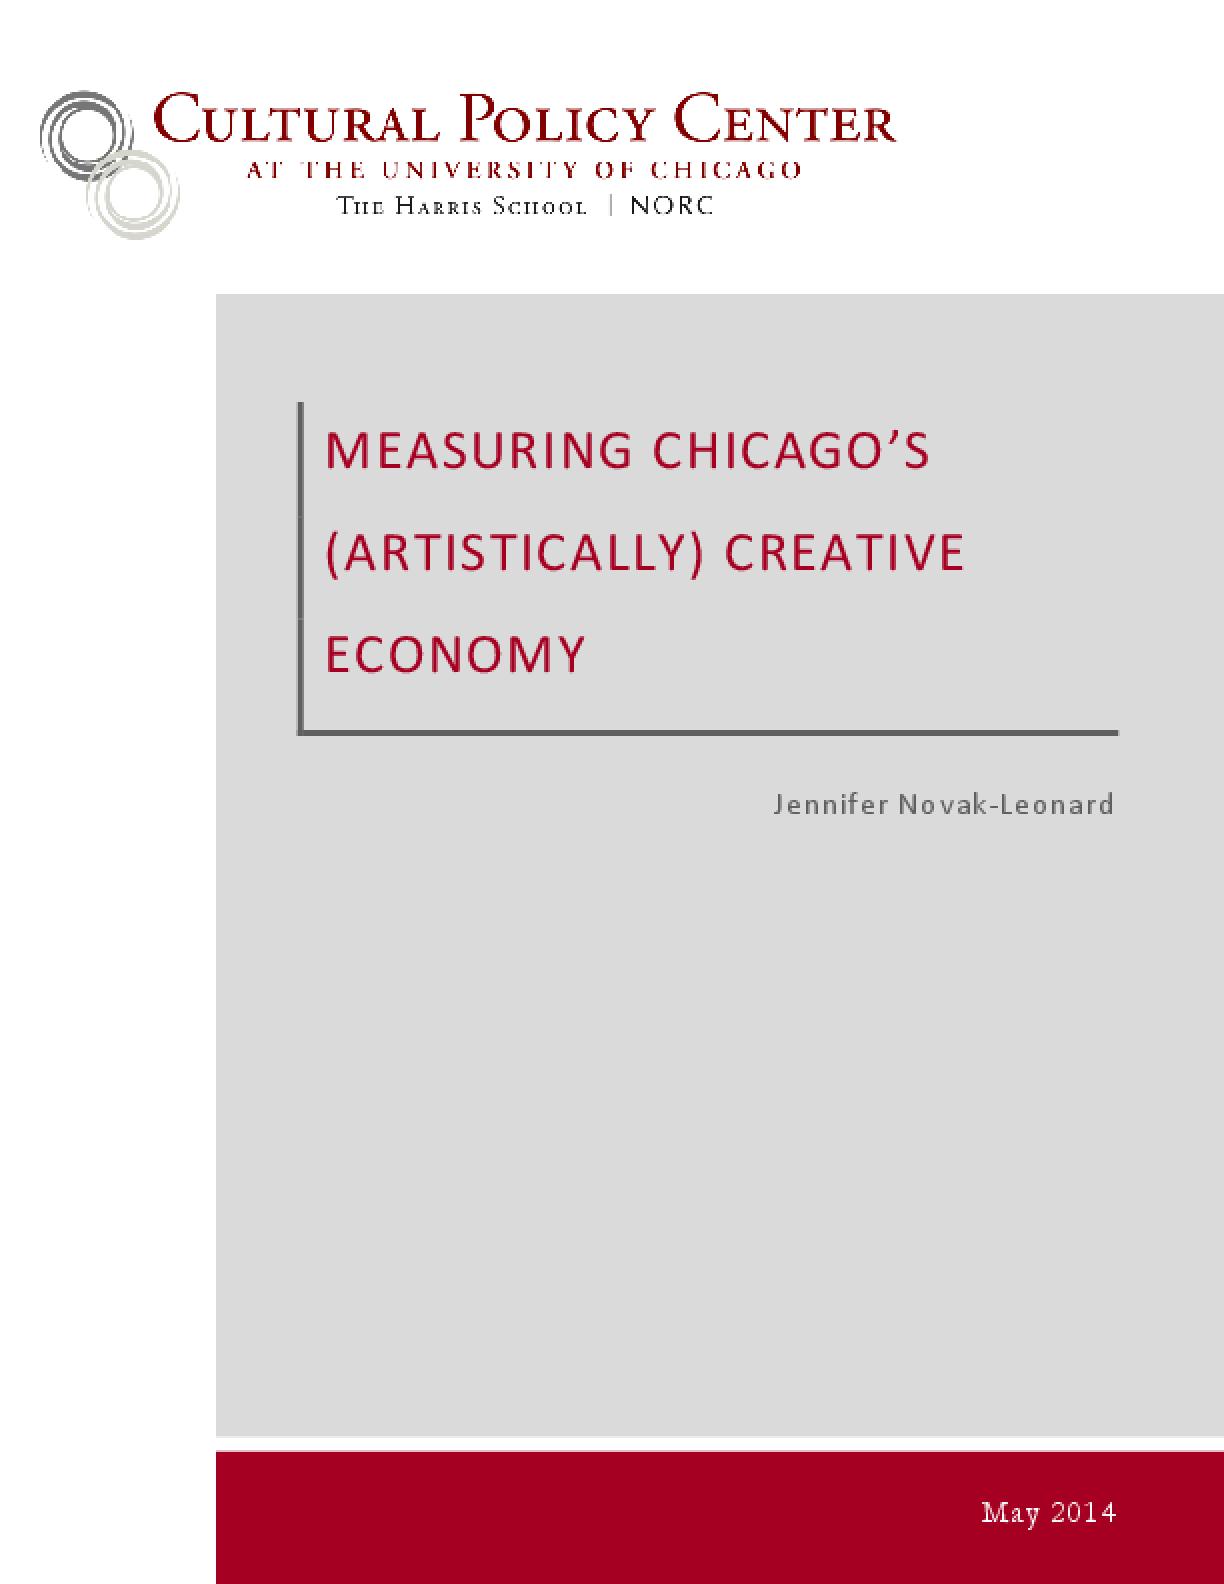 Measuring Chicago's (Artistically) Creative Economy